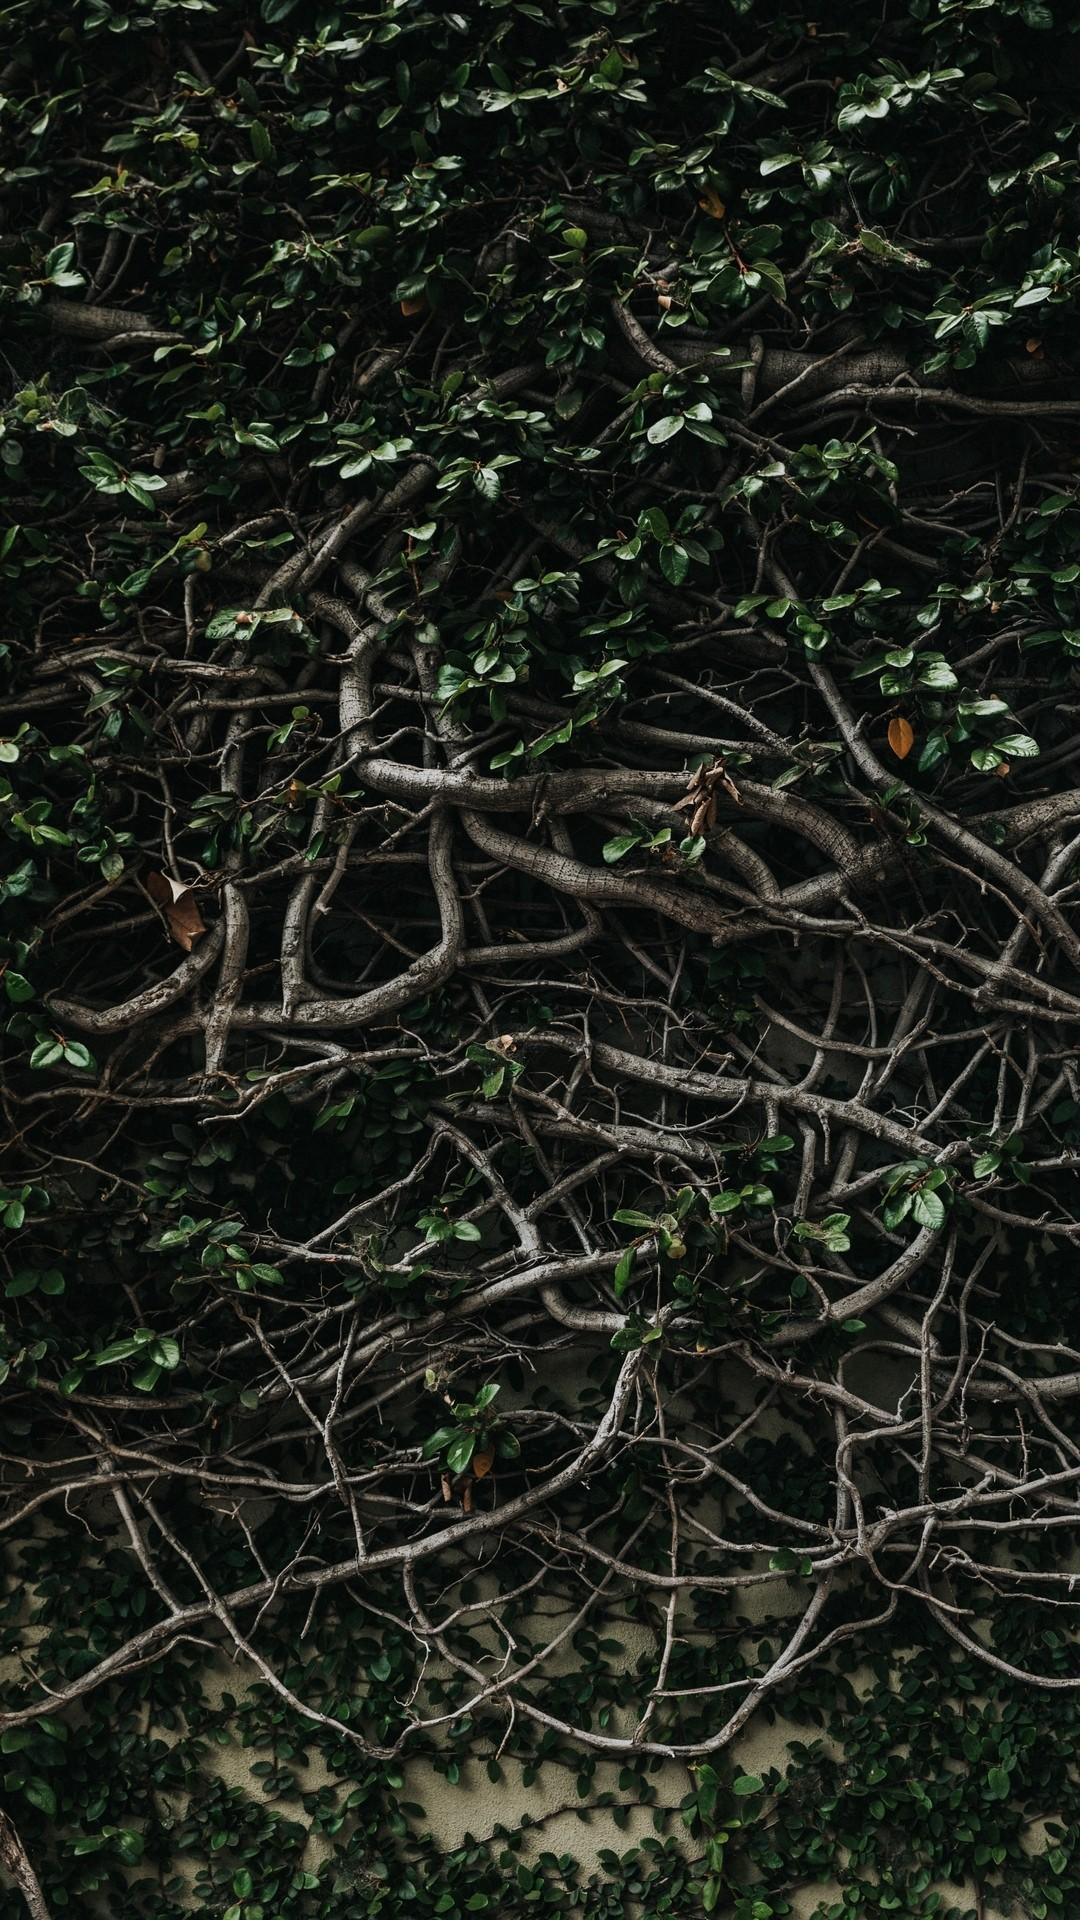 Vineyard Vines wallpaper for iPhone